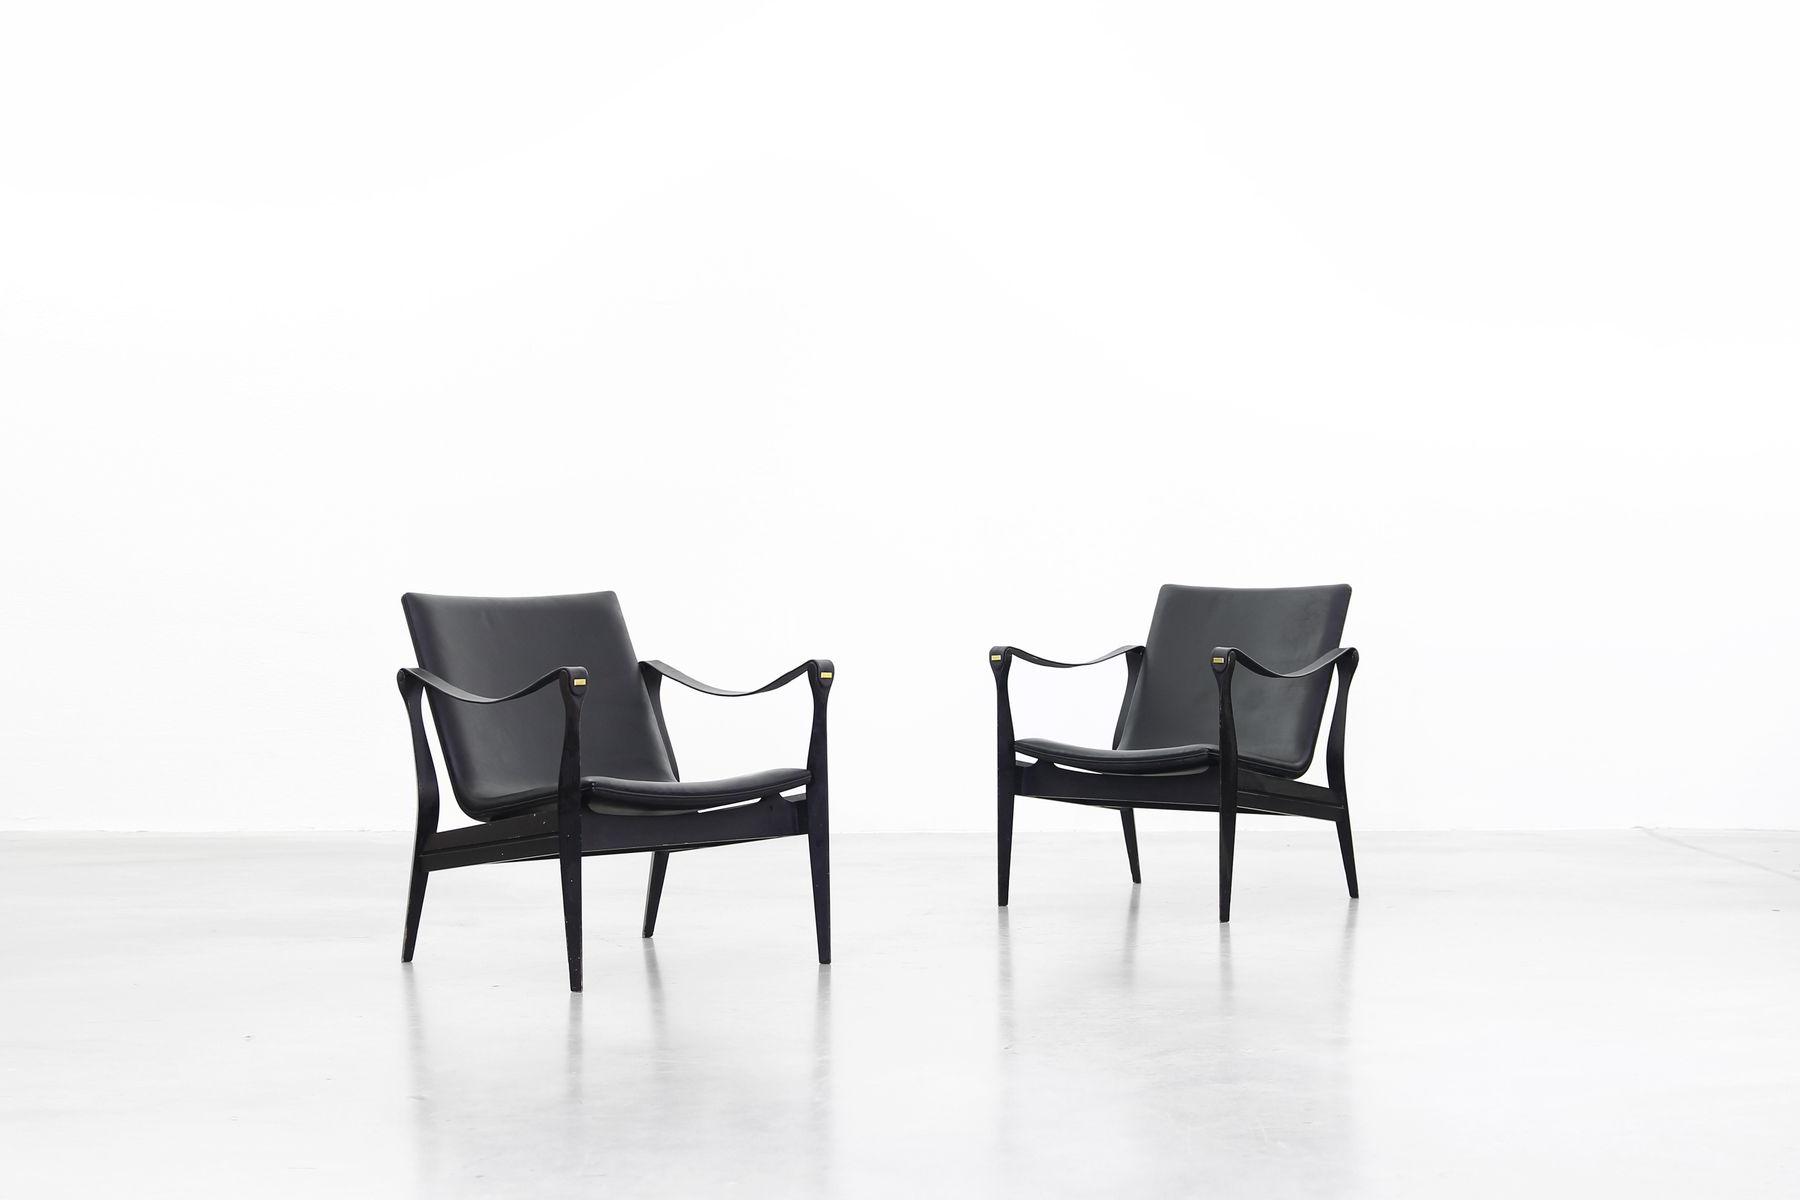 Karen Sofa Chairs Regarding Most Current Vintage Safari Lounge Chairebbe And Karen Clemmensen For Fritz (View 13 of 20)